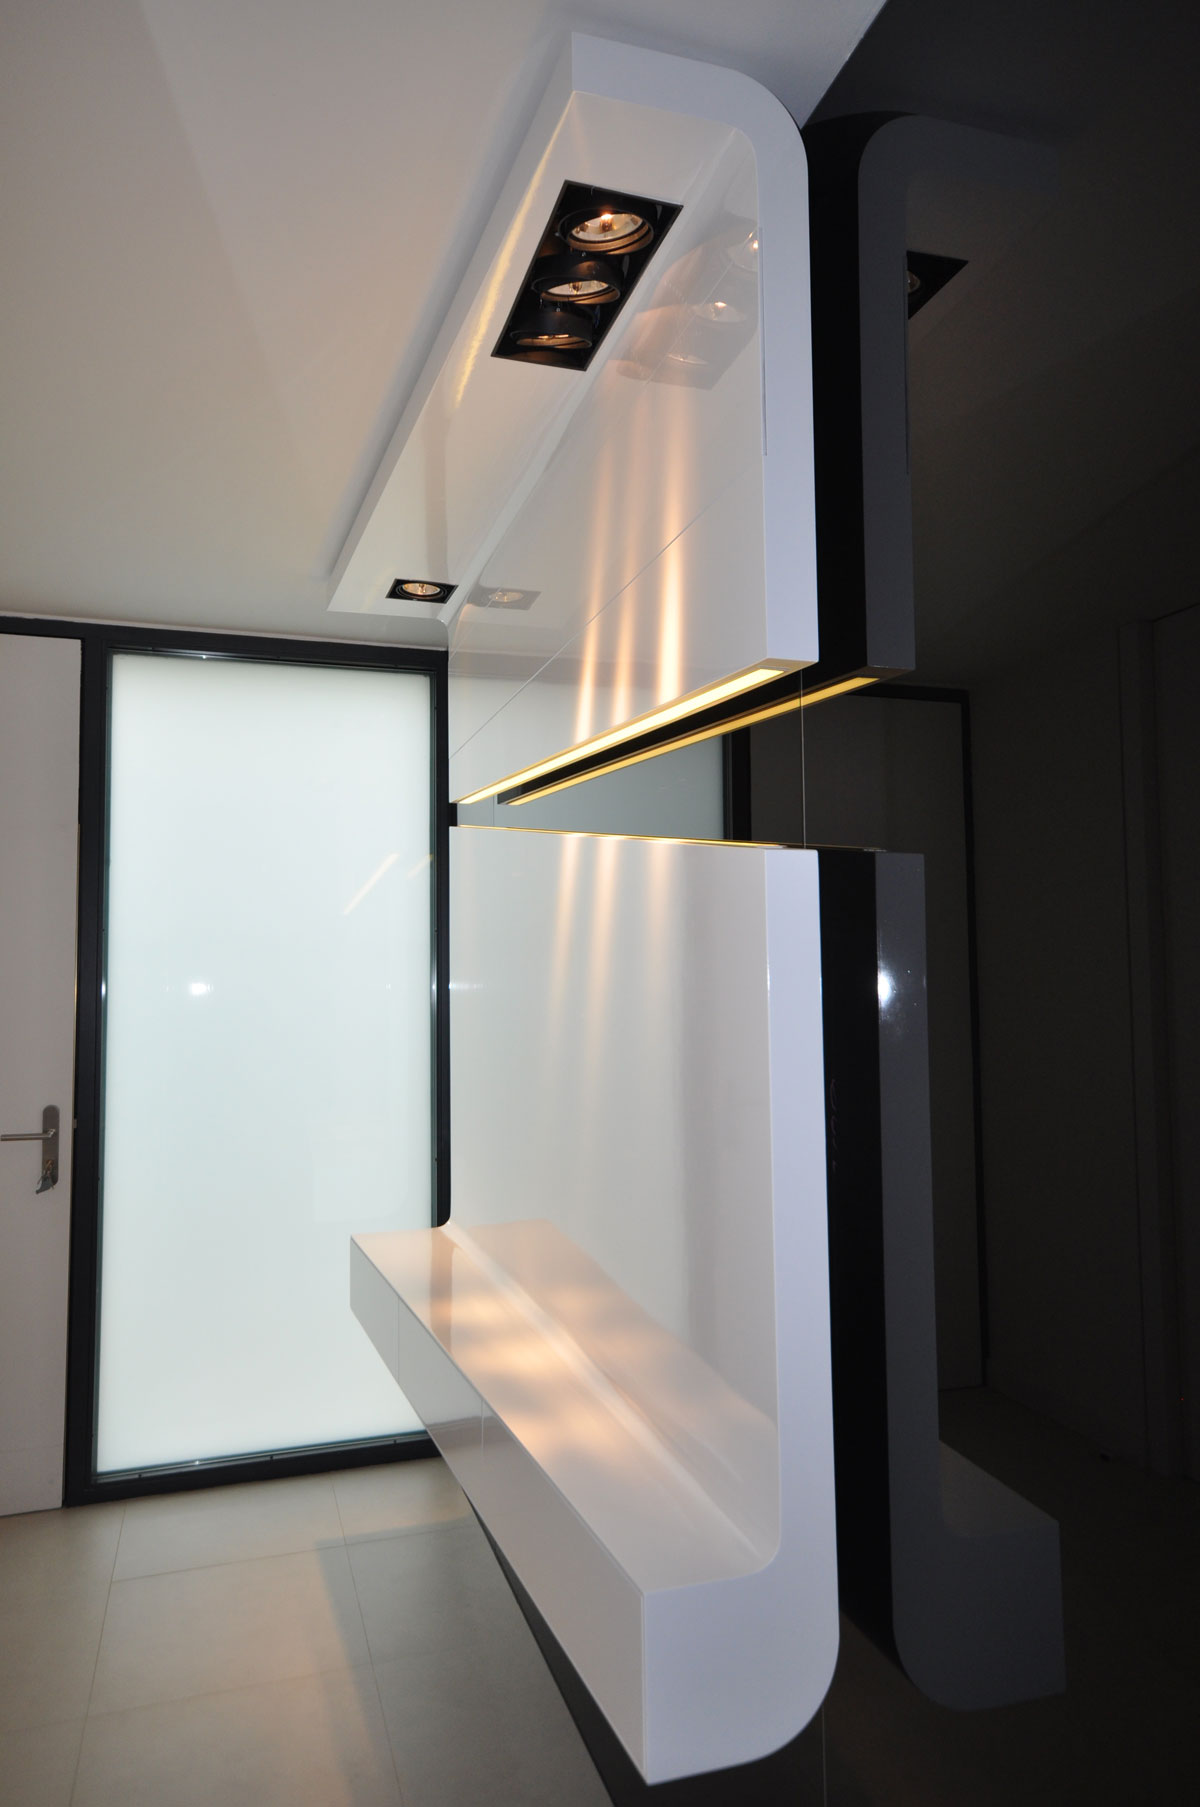 Mueble recibidor moderno arinni estudio - Mueble recibidor moderno ...